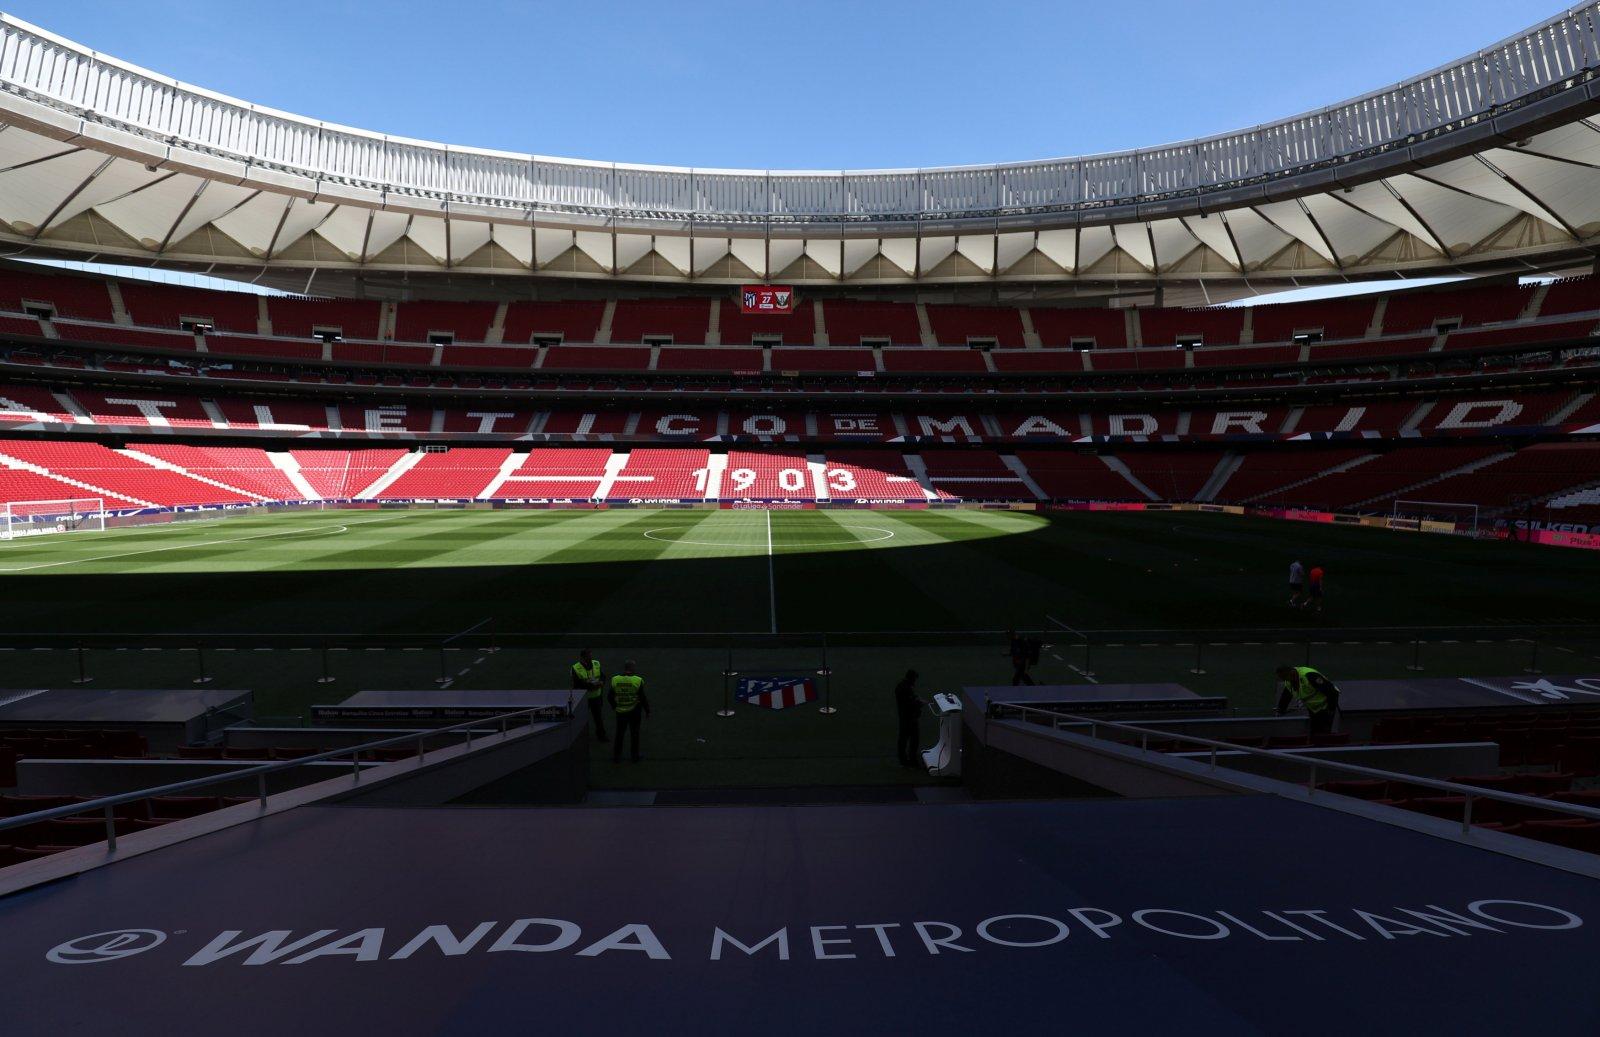 Atletico Madrid - Wanda Metropolitano